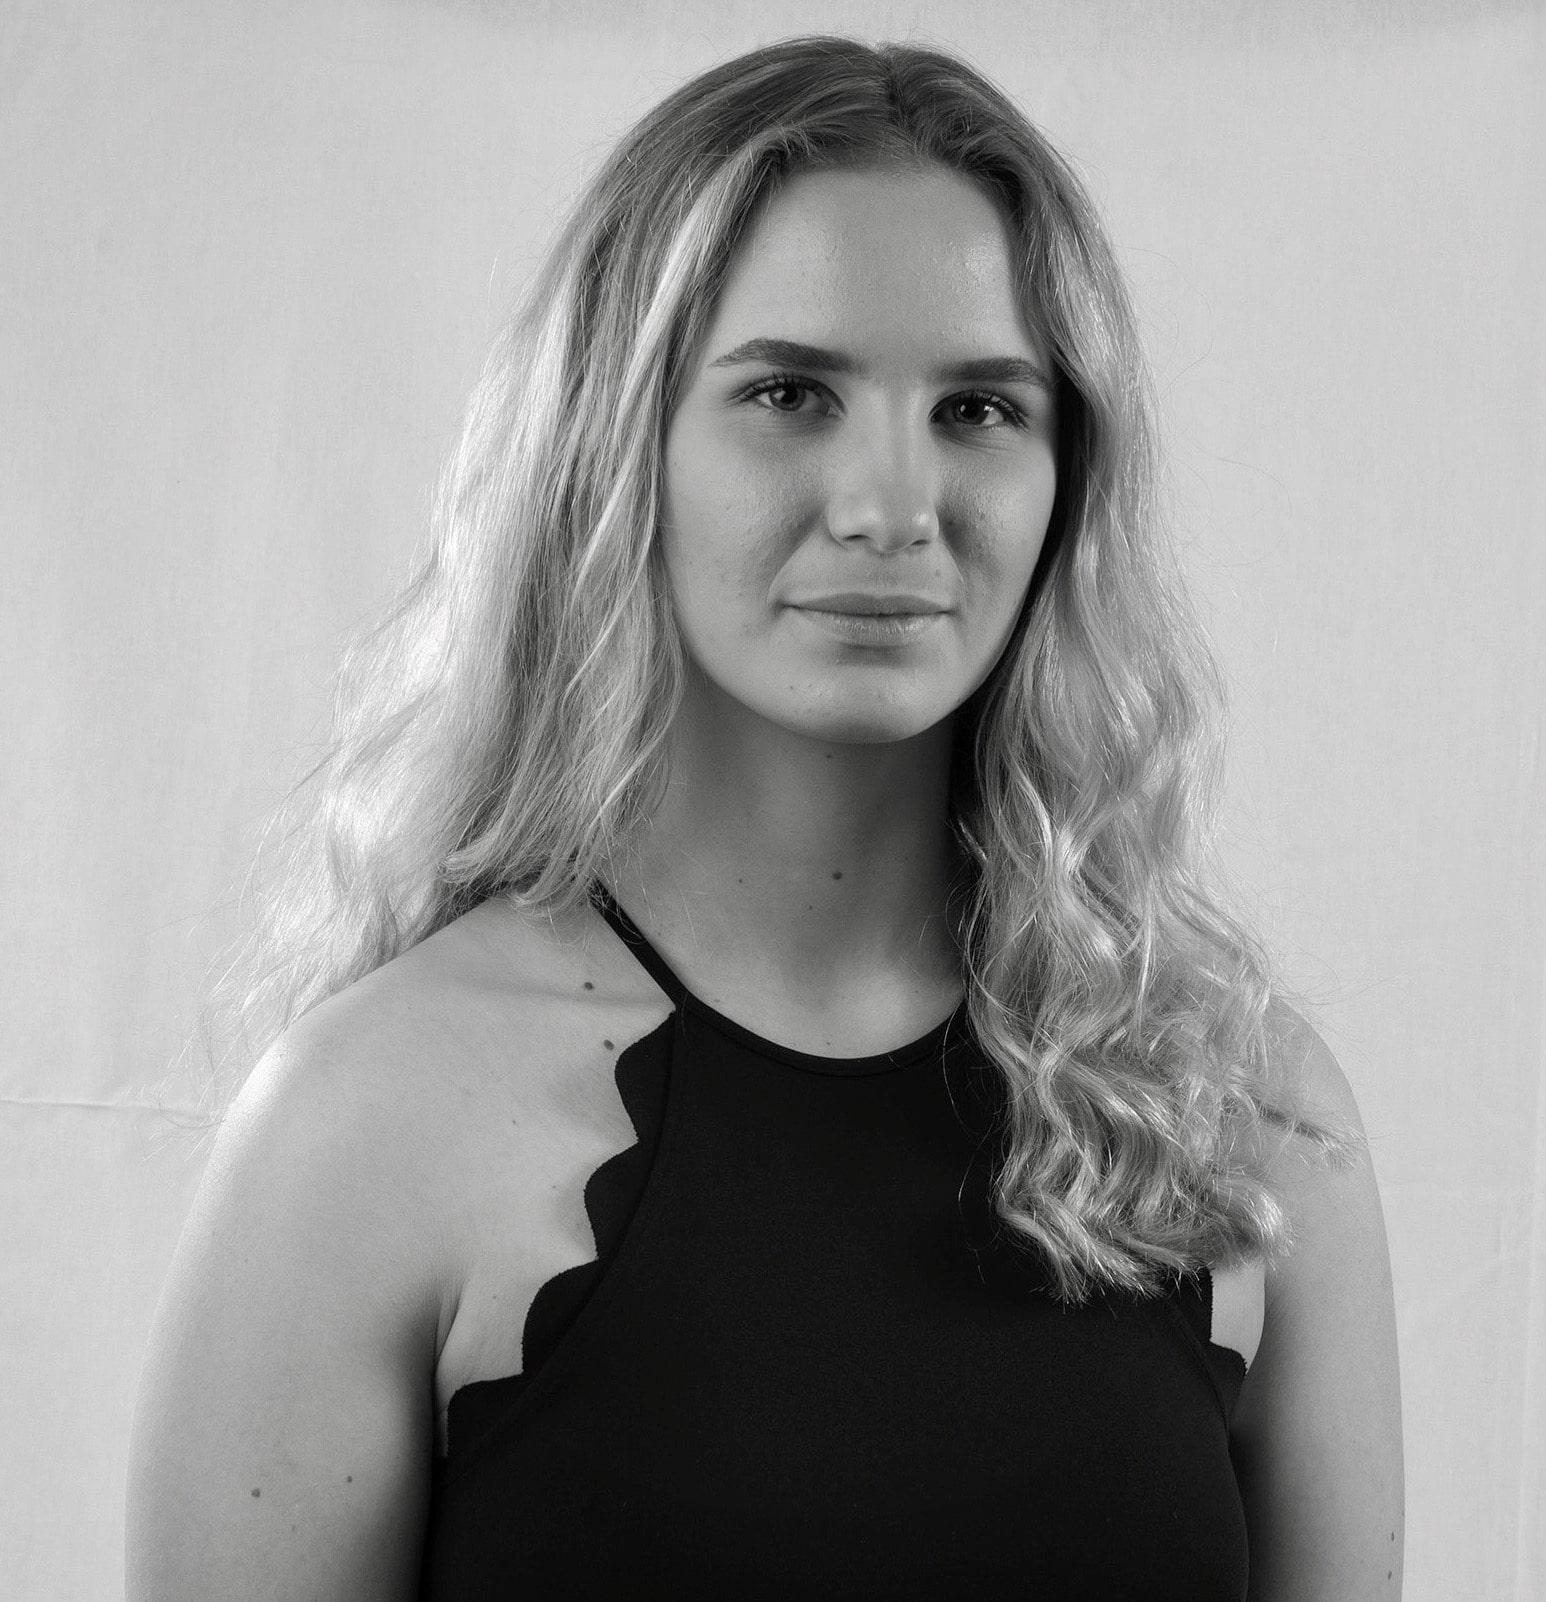 Mina Christoffersson